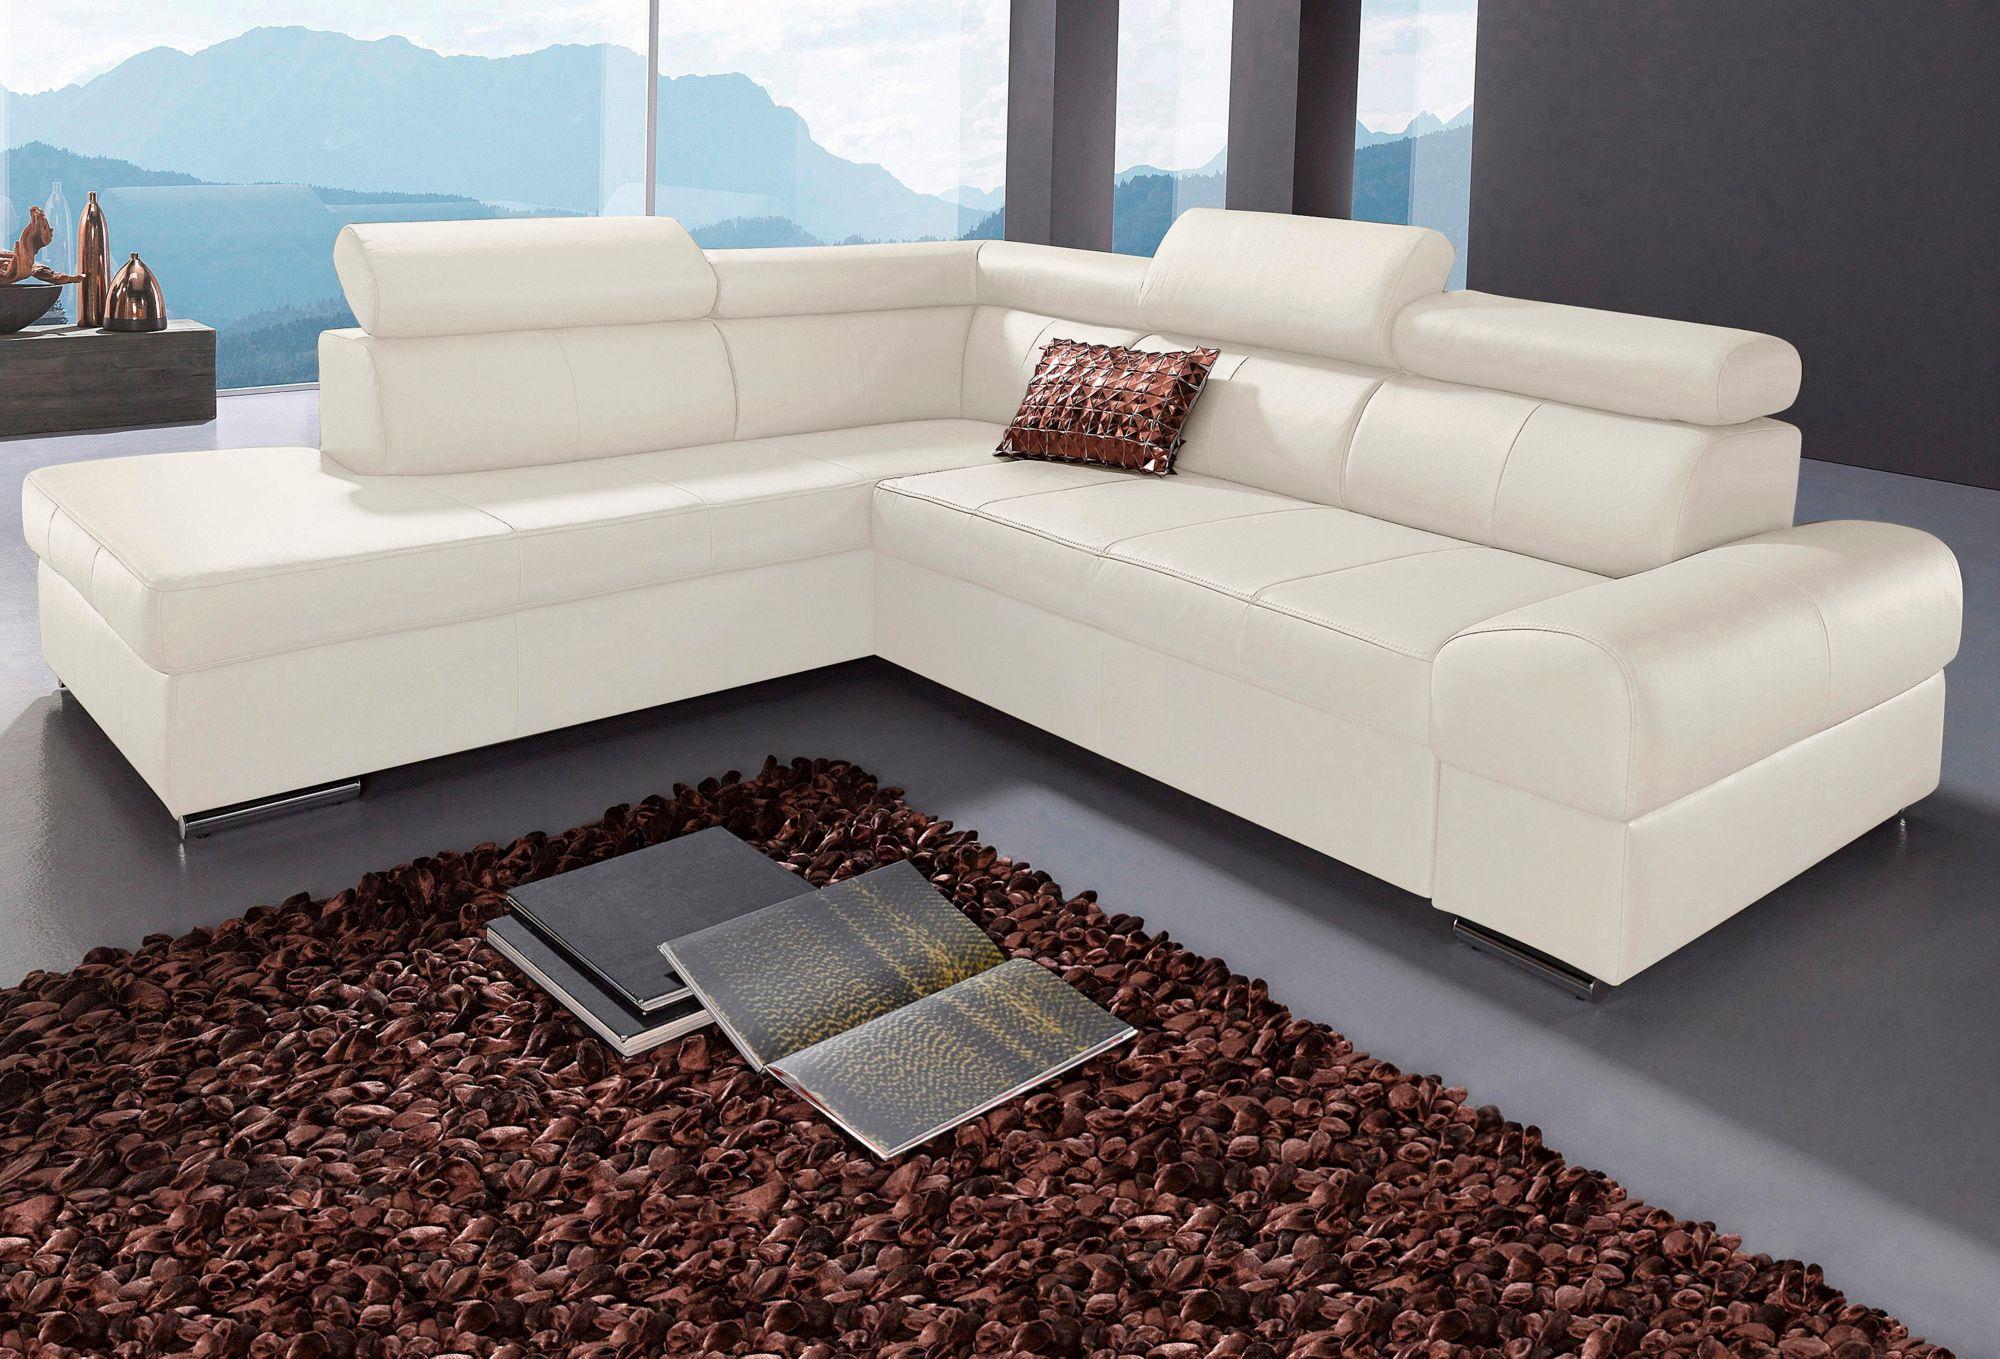 polsterecke sit more wahlweise mit bettfunktion schwab versand ecksofas. Black Bedroom Furniture Sets. Home Design Ideas